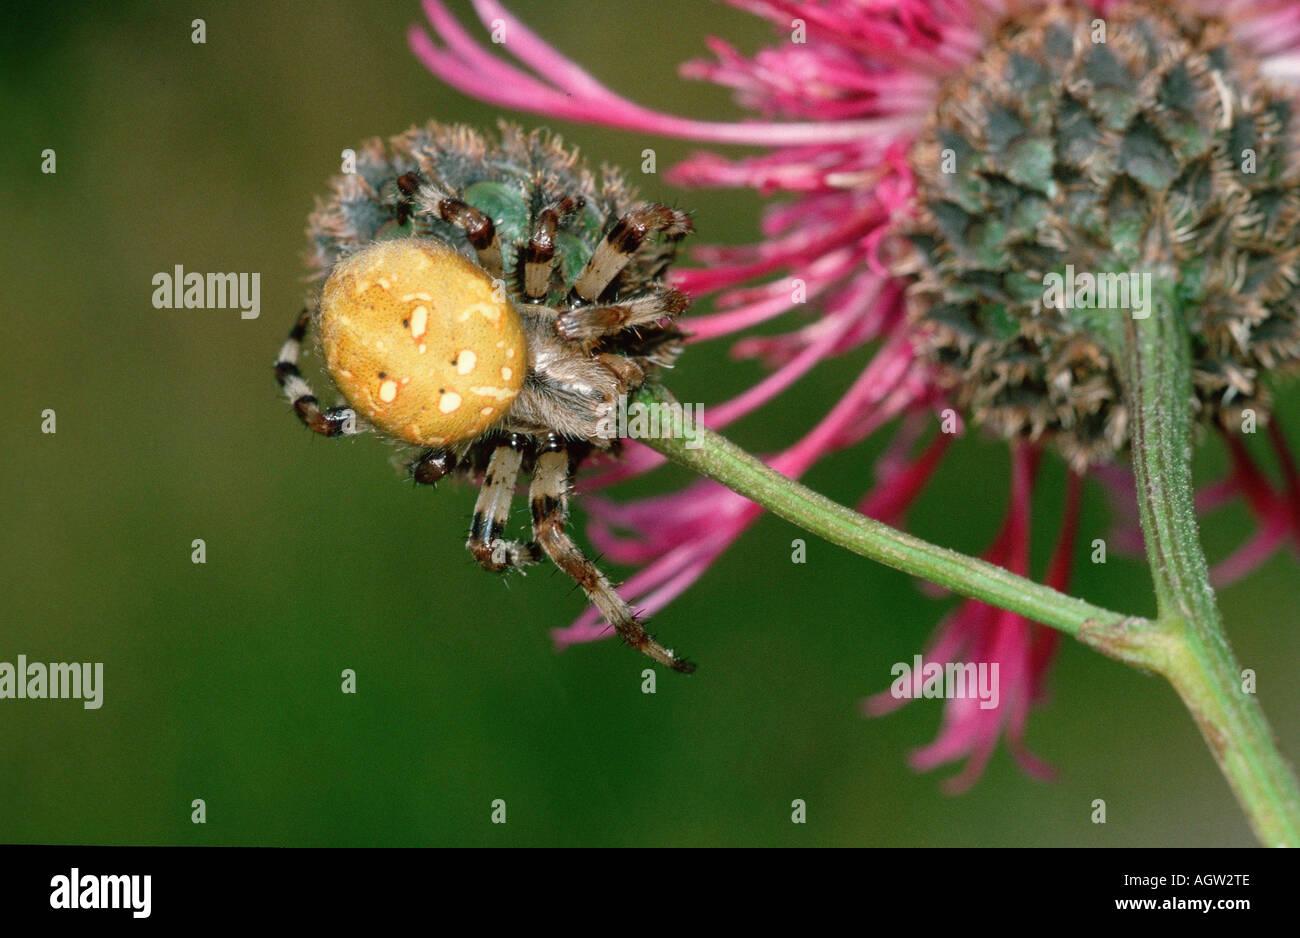 Fourspotted Orbweaver - Stock Image